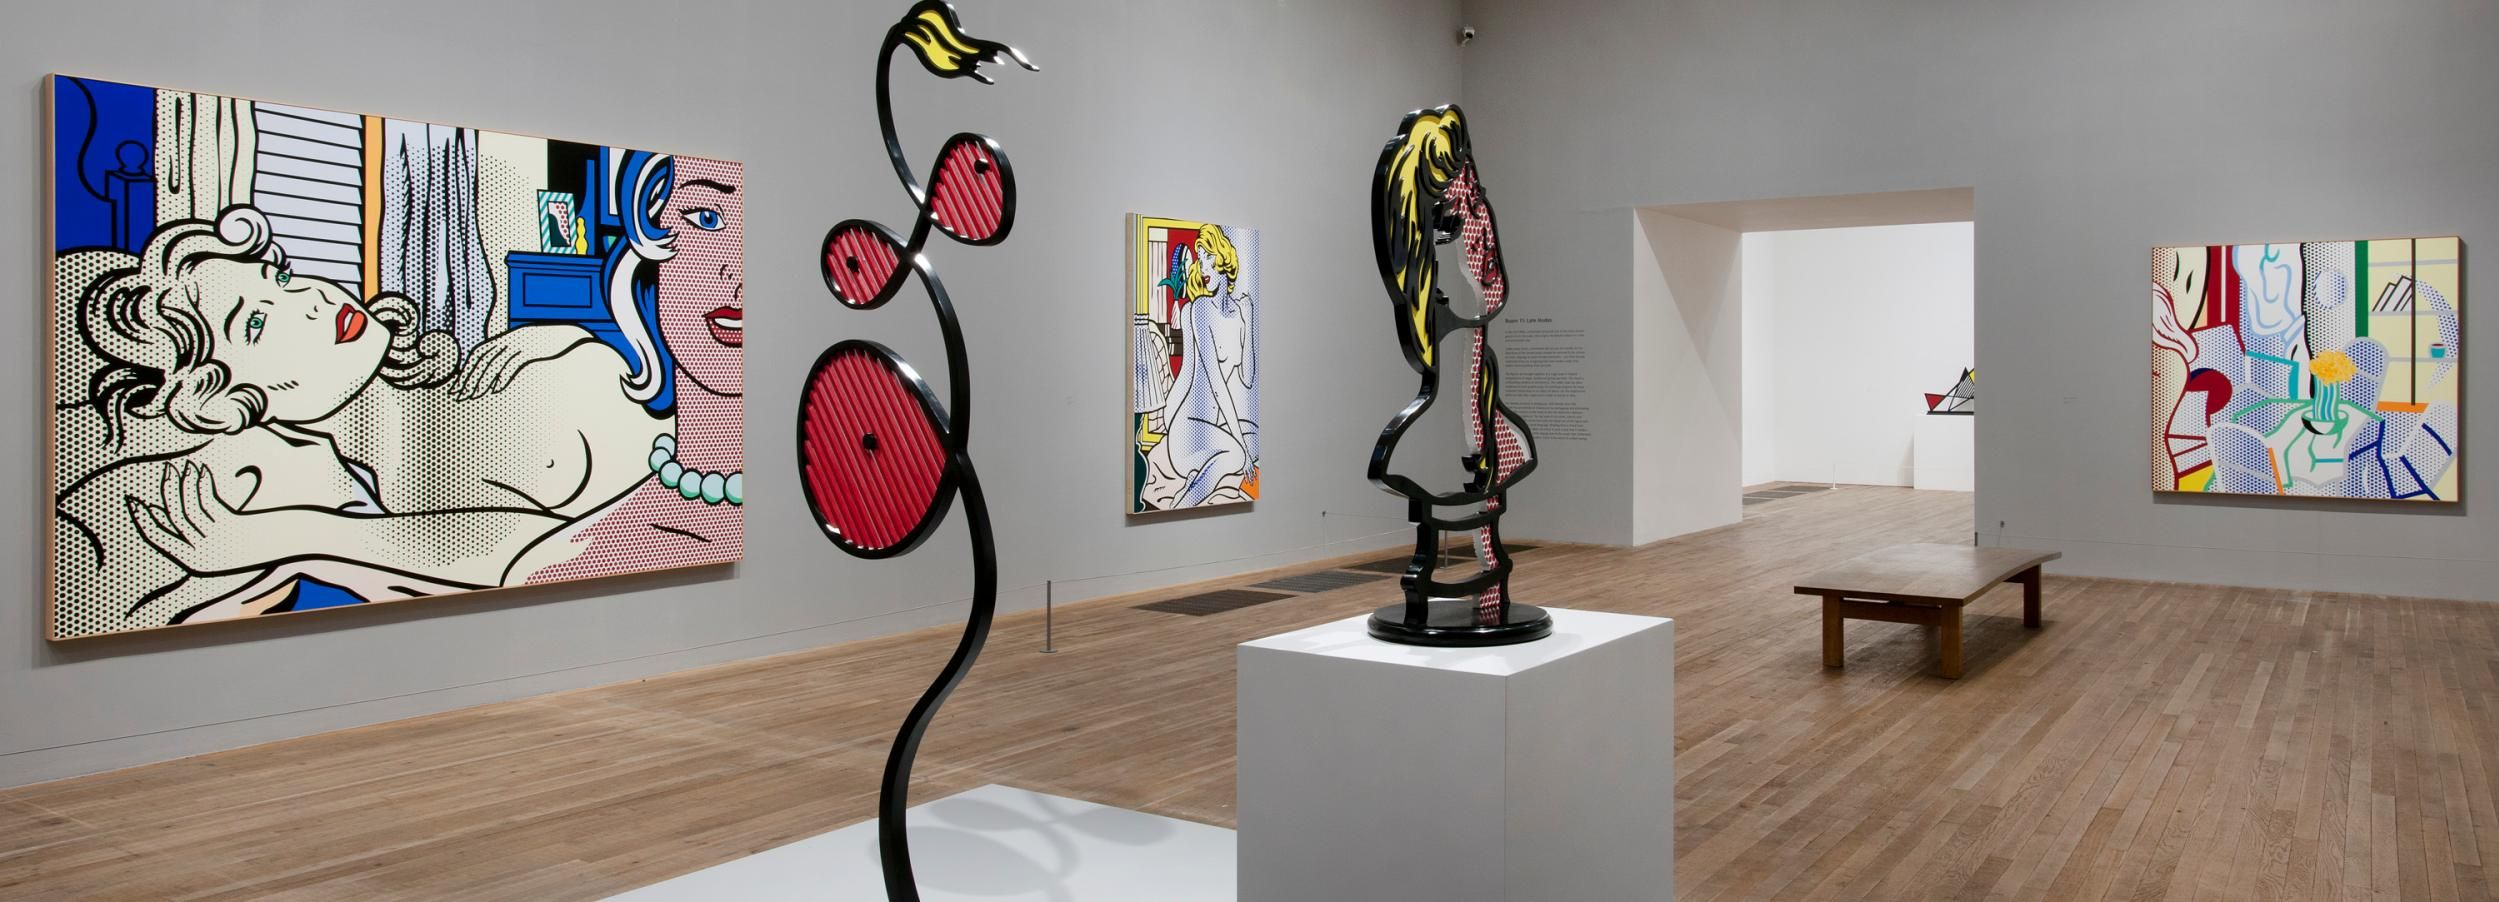 Tate Modern: tour guidato del museo